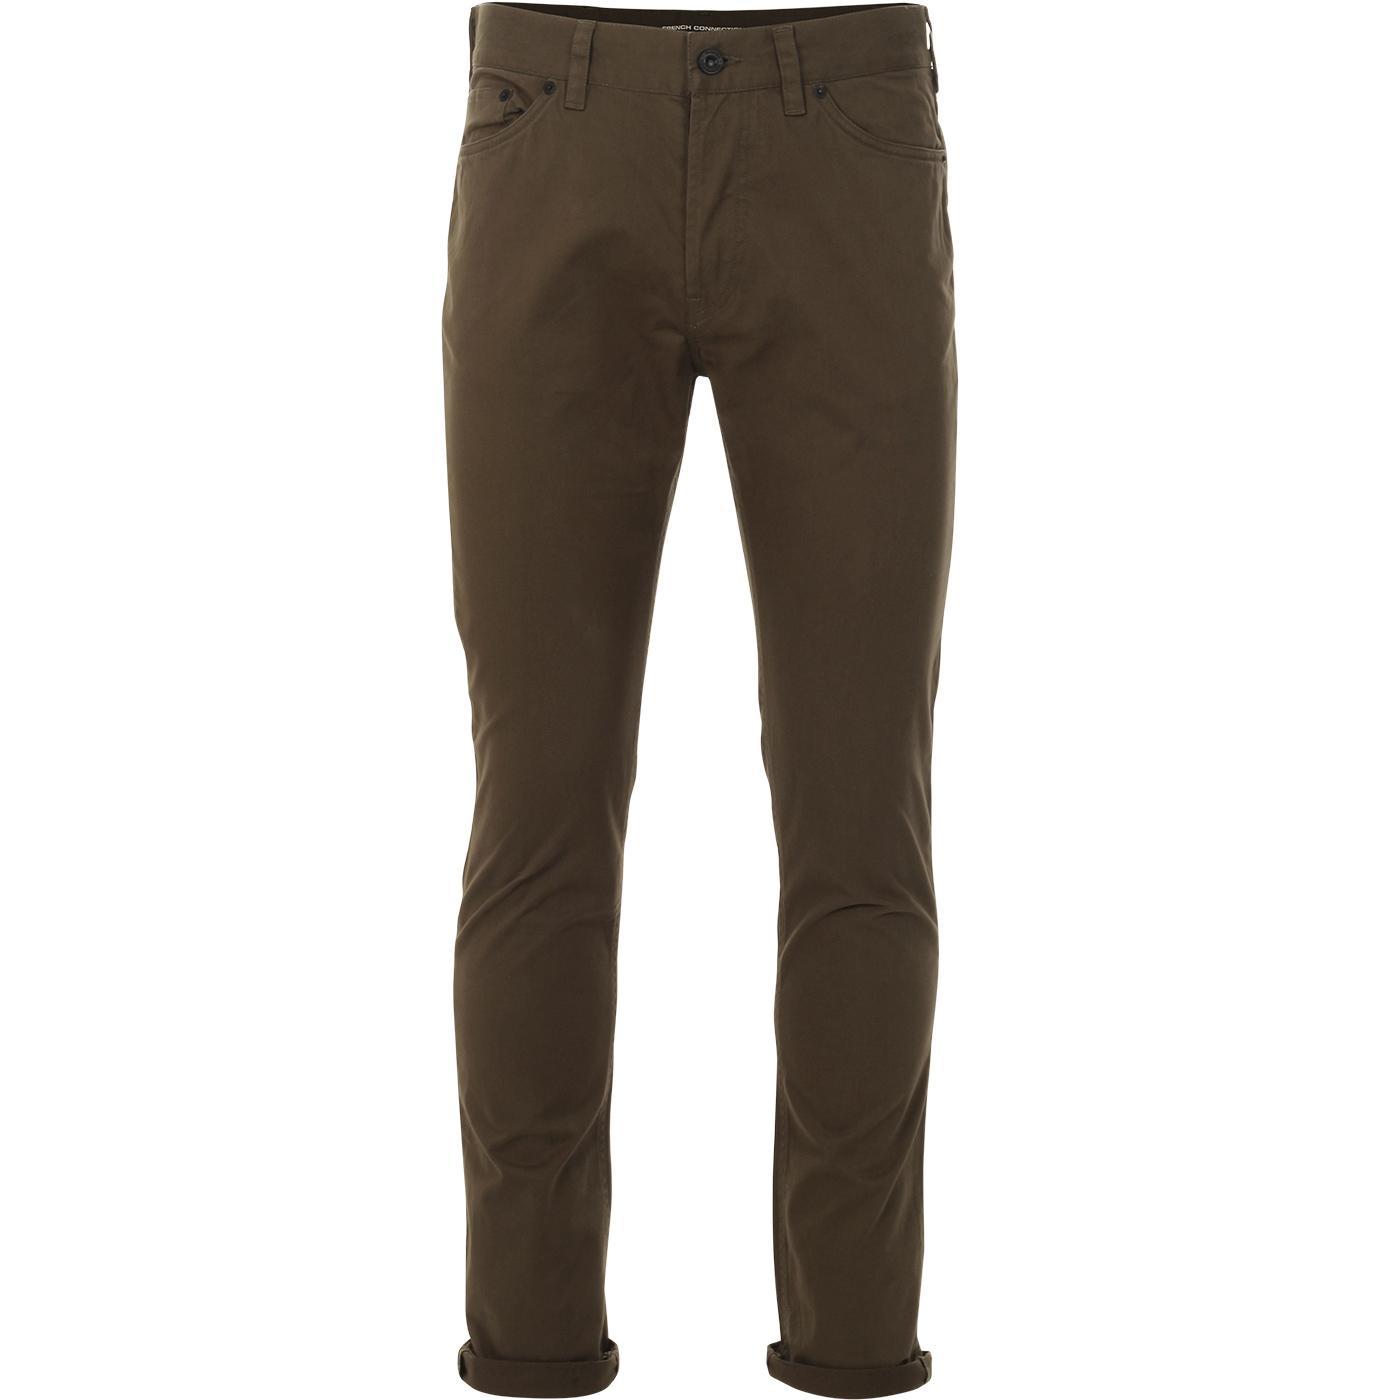 FRENCH CONNECTION Slim Machine Stretch Jeans (TK)